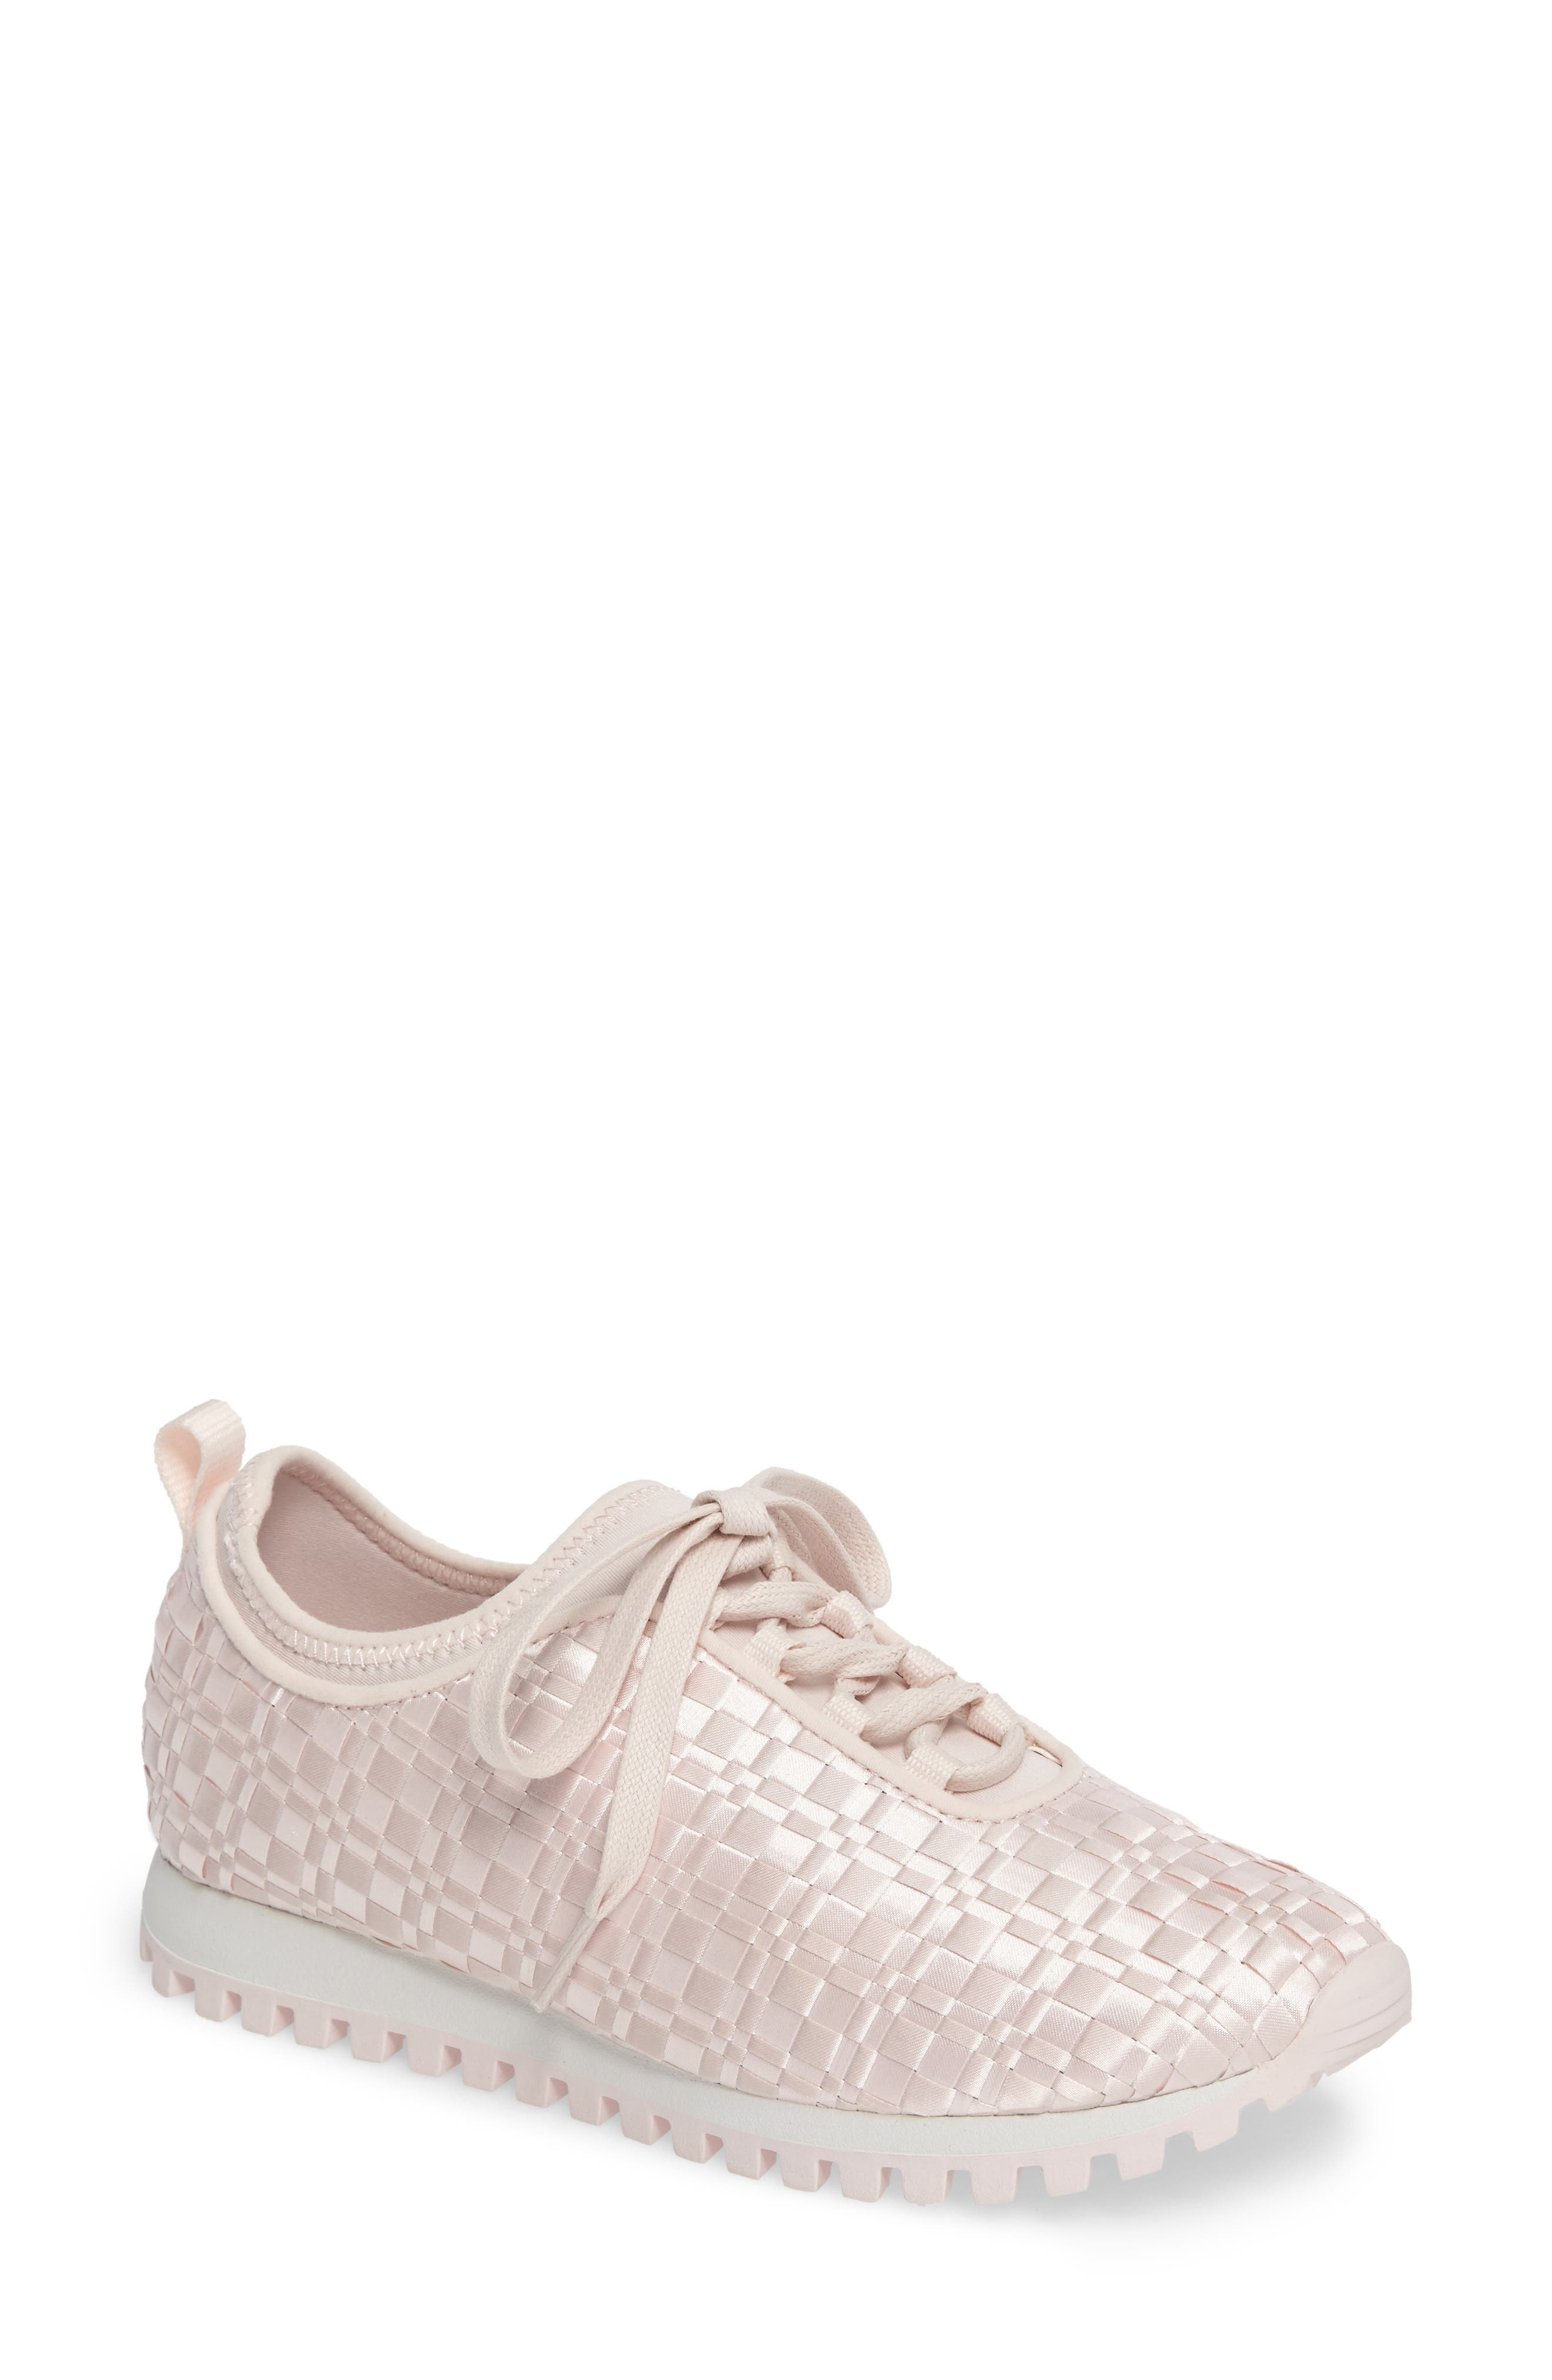 Lynn Sock Fit Woven Sneaker,                             Main thumbnail 1, color,                             Dusty Rose